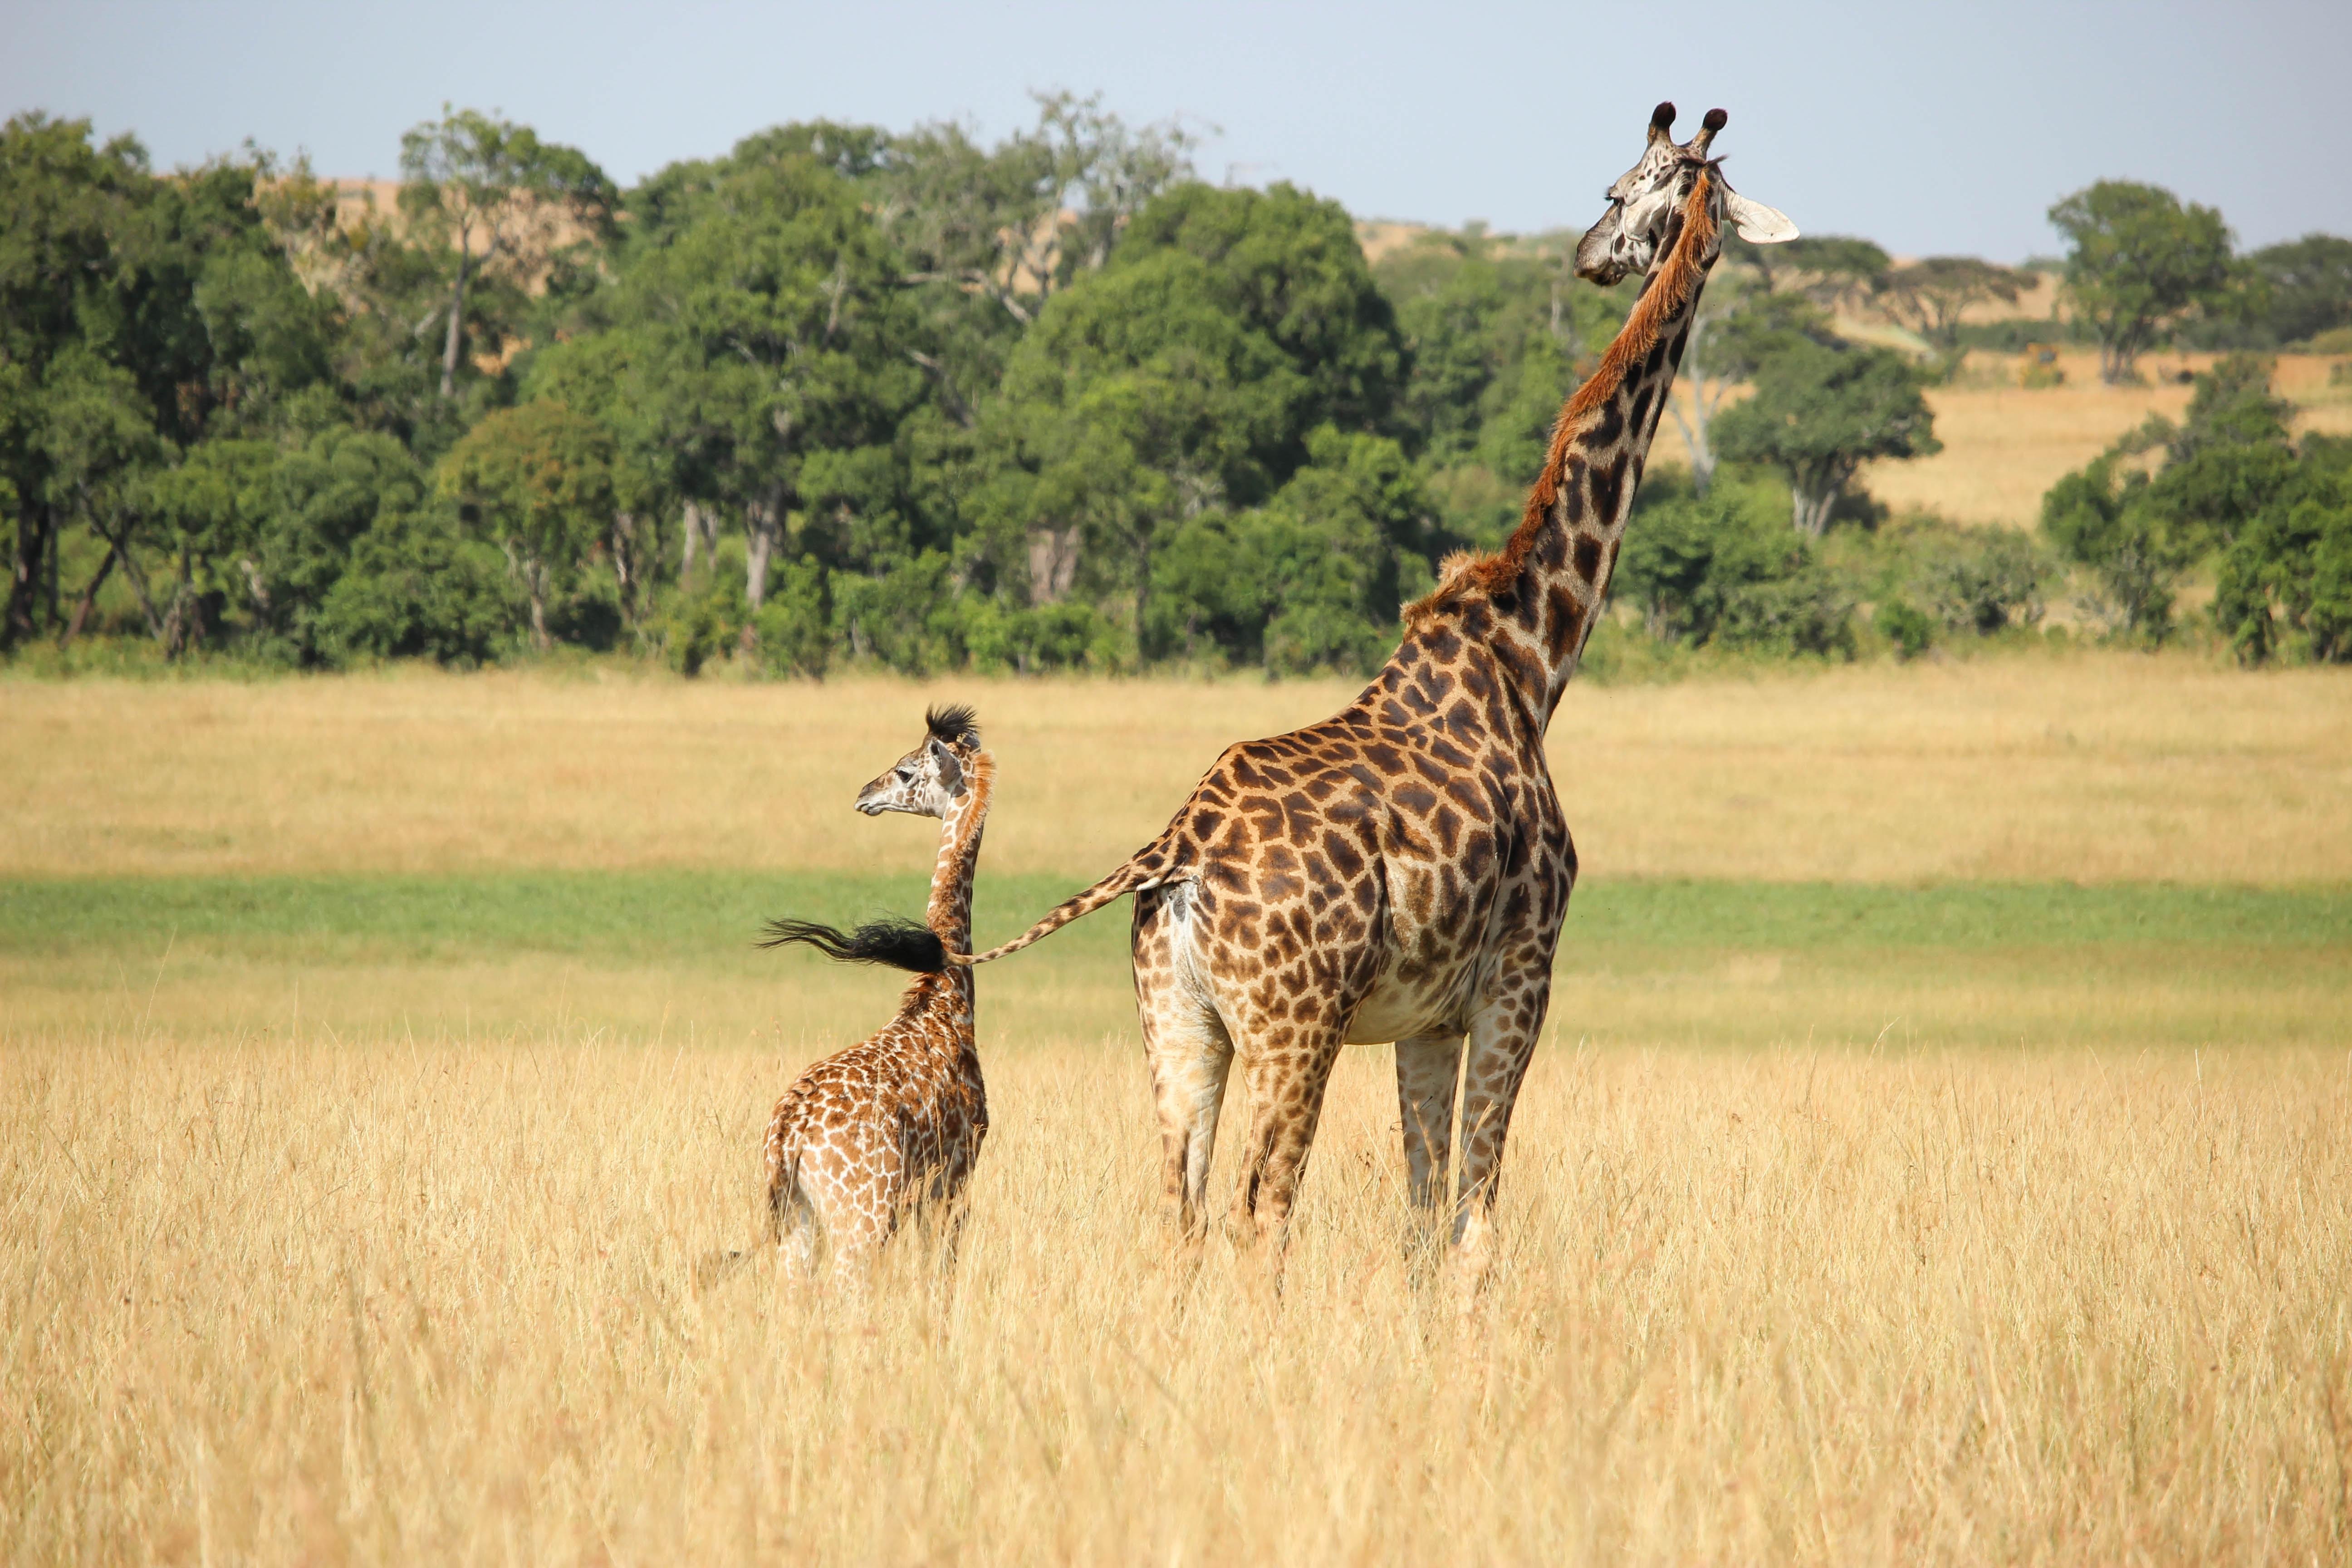 One adult and one baby giraffe walking in the Masai Mara Game Reserve Savanna